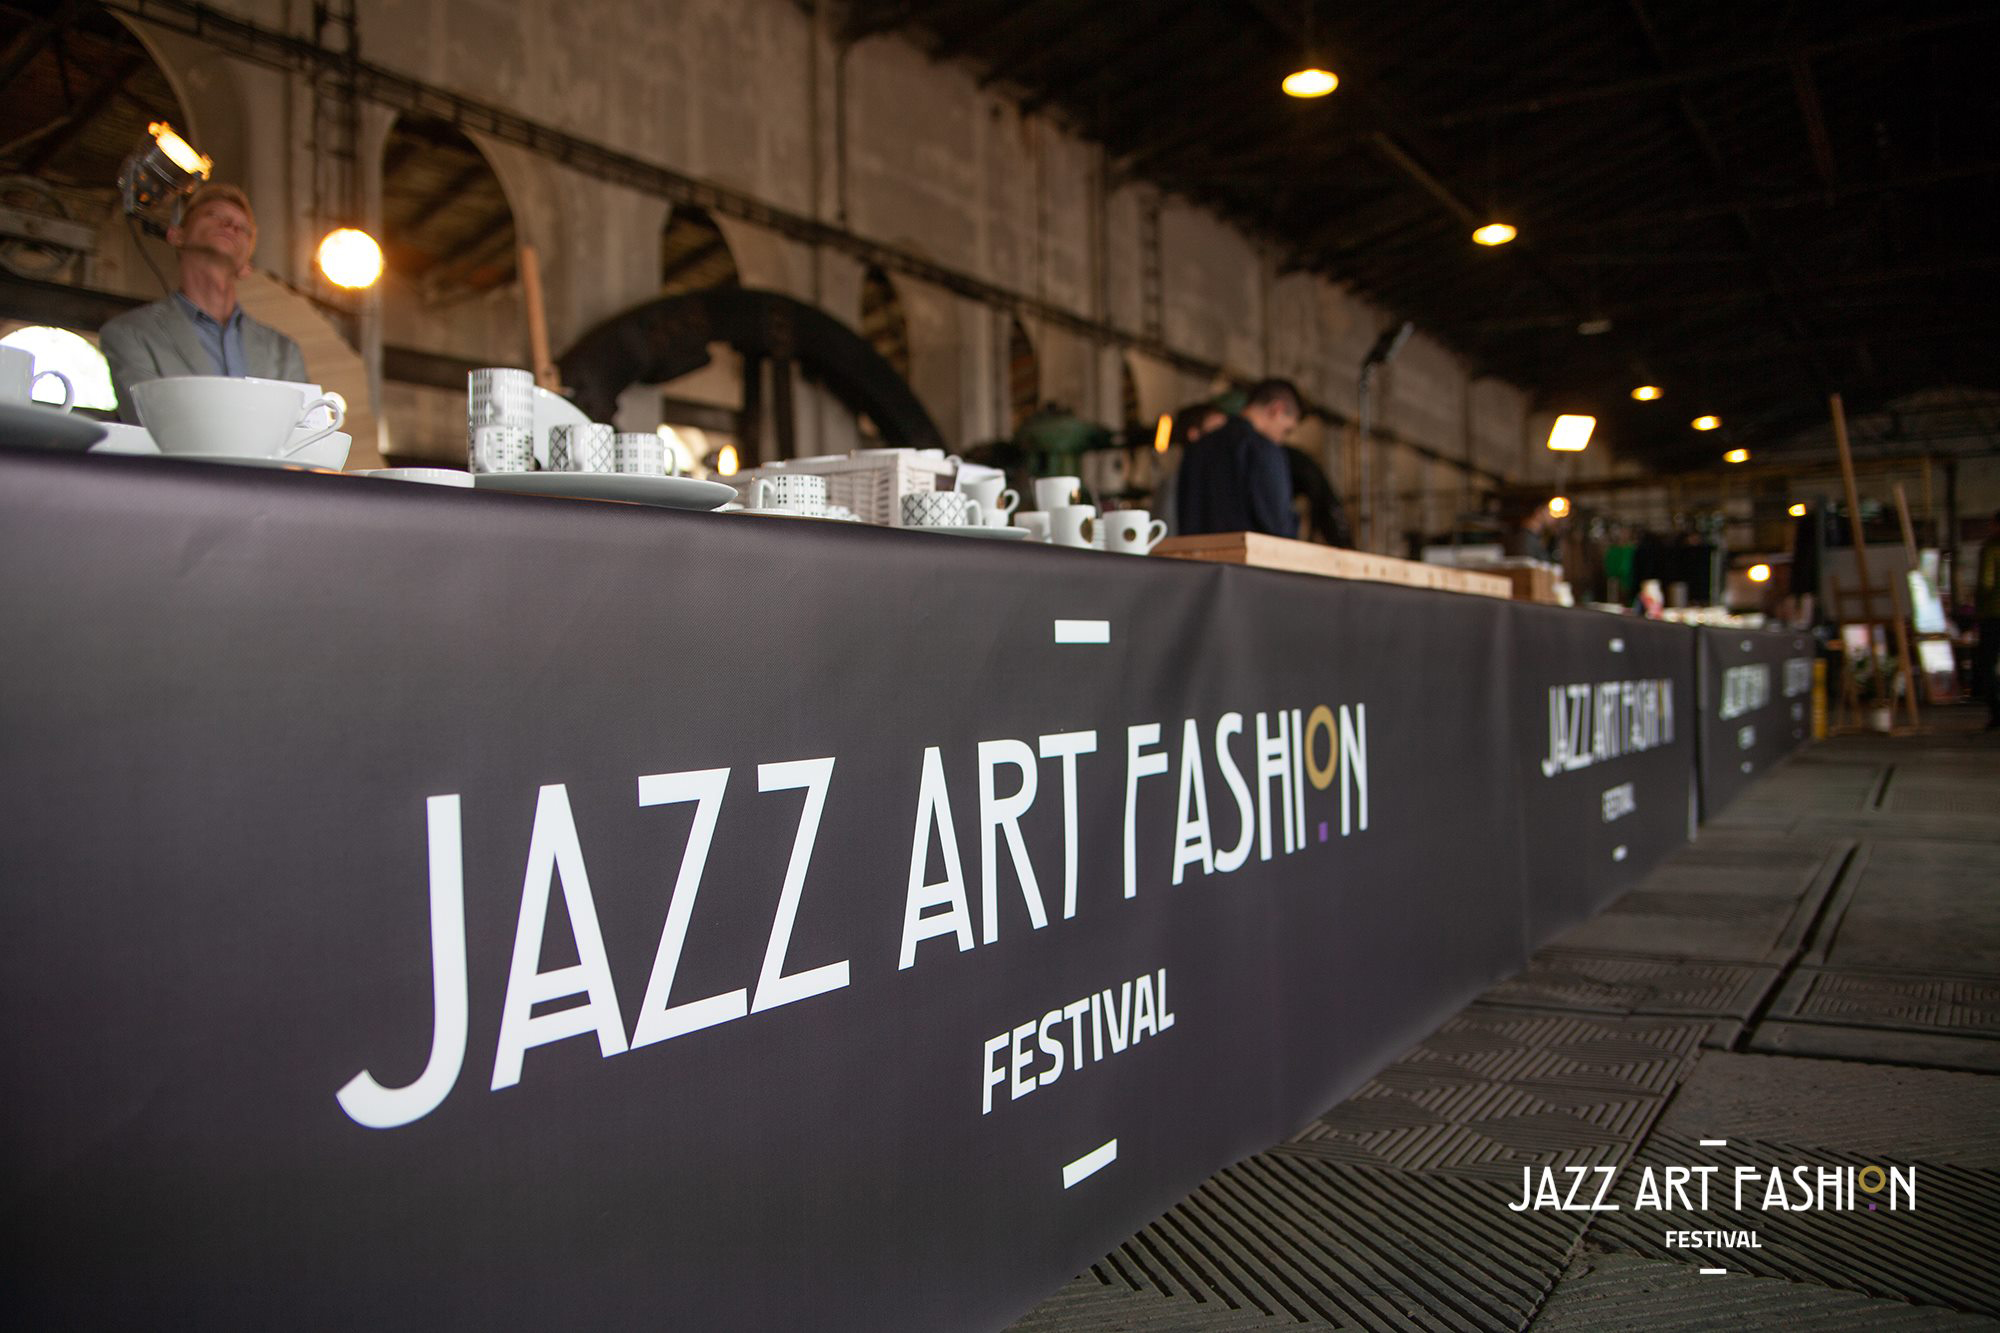 Stół z napisem Jazz Art Fashion Festival